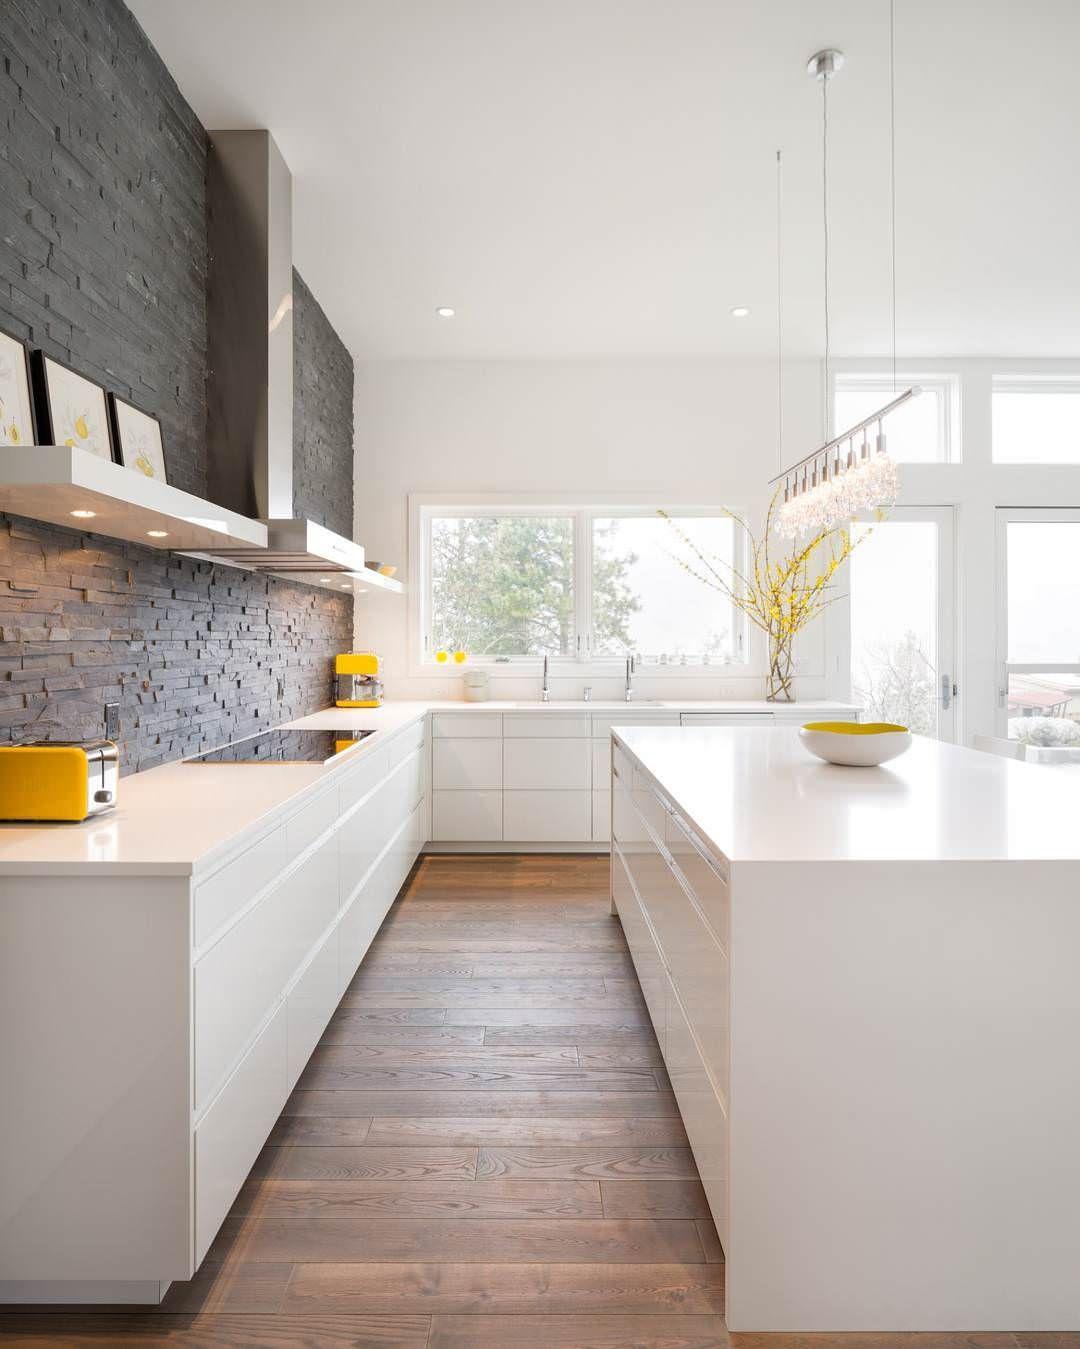 Cucina moderna bianca con parete giallo senape. Pin On Home Design Kitchens